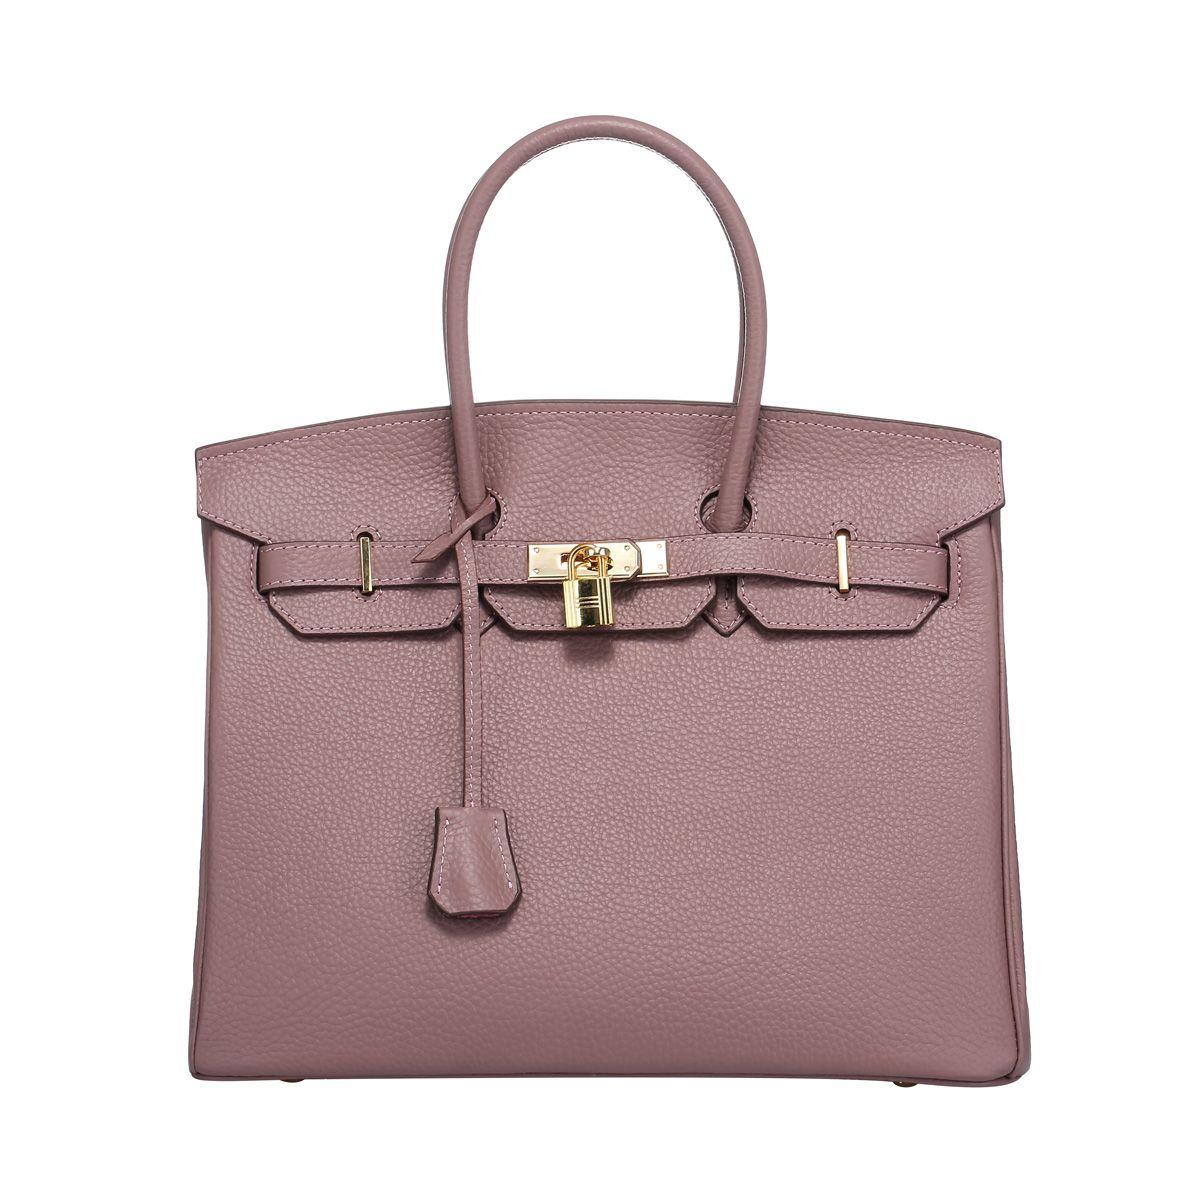 35cm Fashion Women Handbags Good Quality Bright Leather Women Bags Famous  Brand Women Shoulder Bags Ladies Tote Fashion Handbags Large Handbags From  ... 62978db4b1